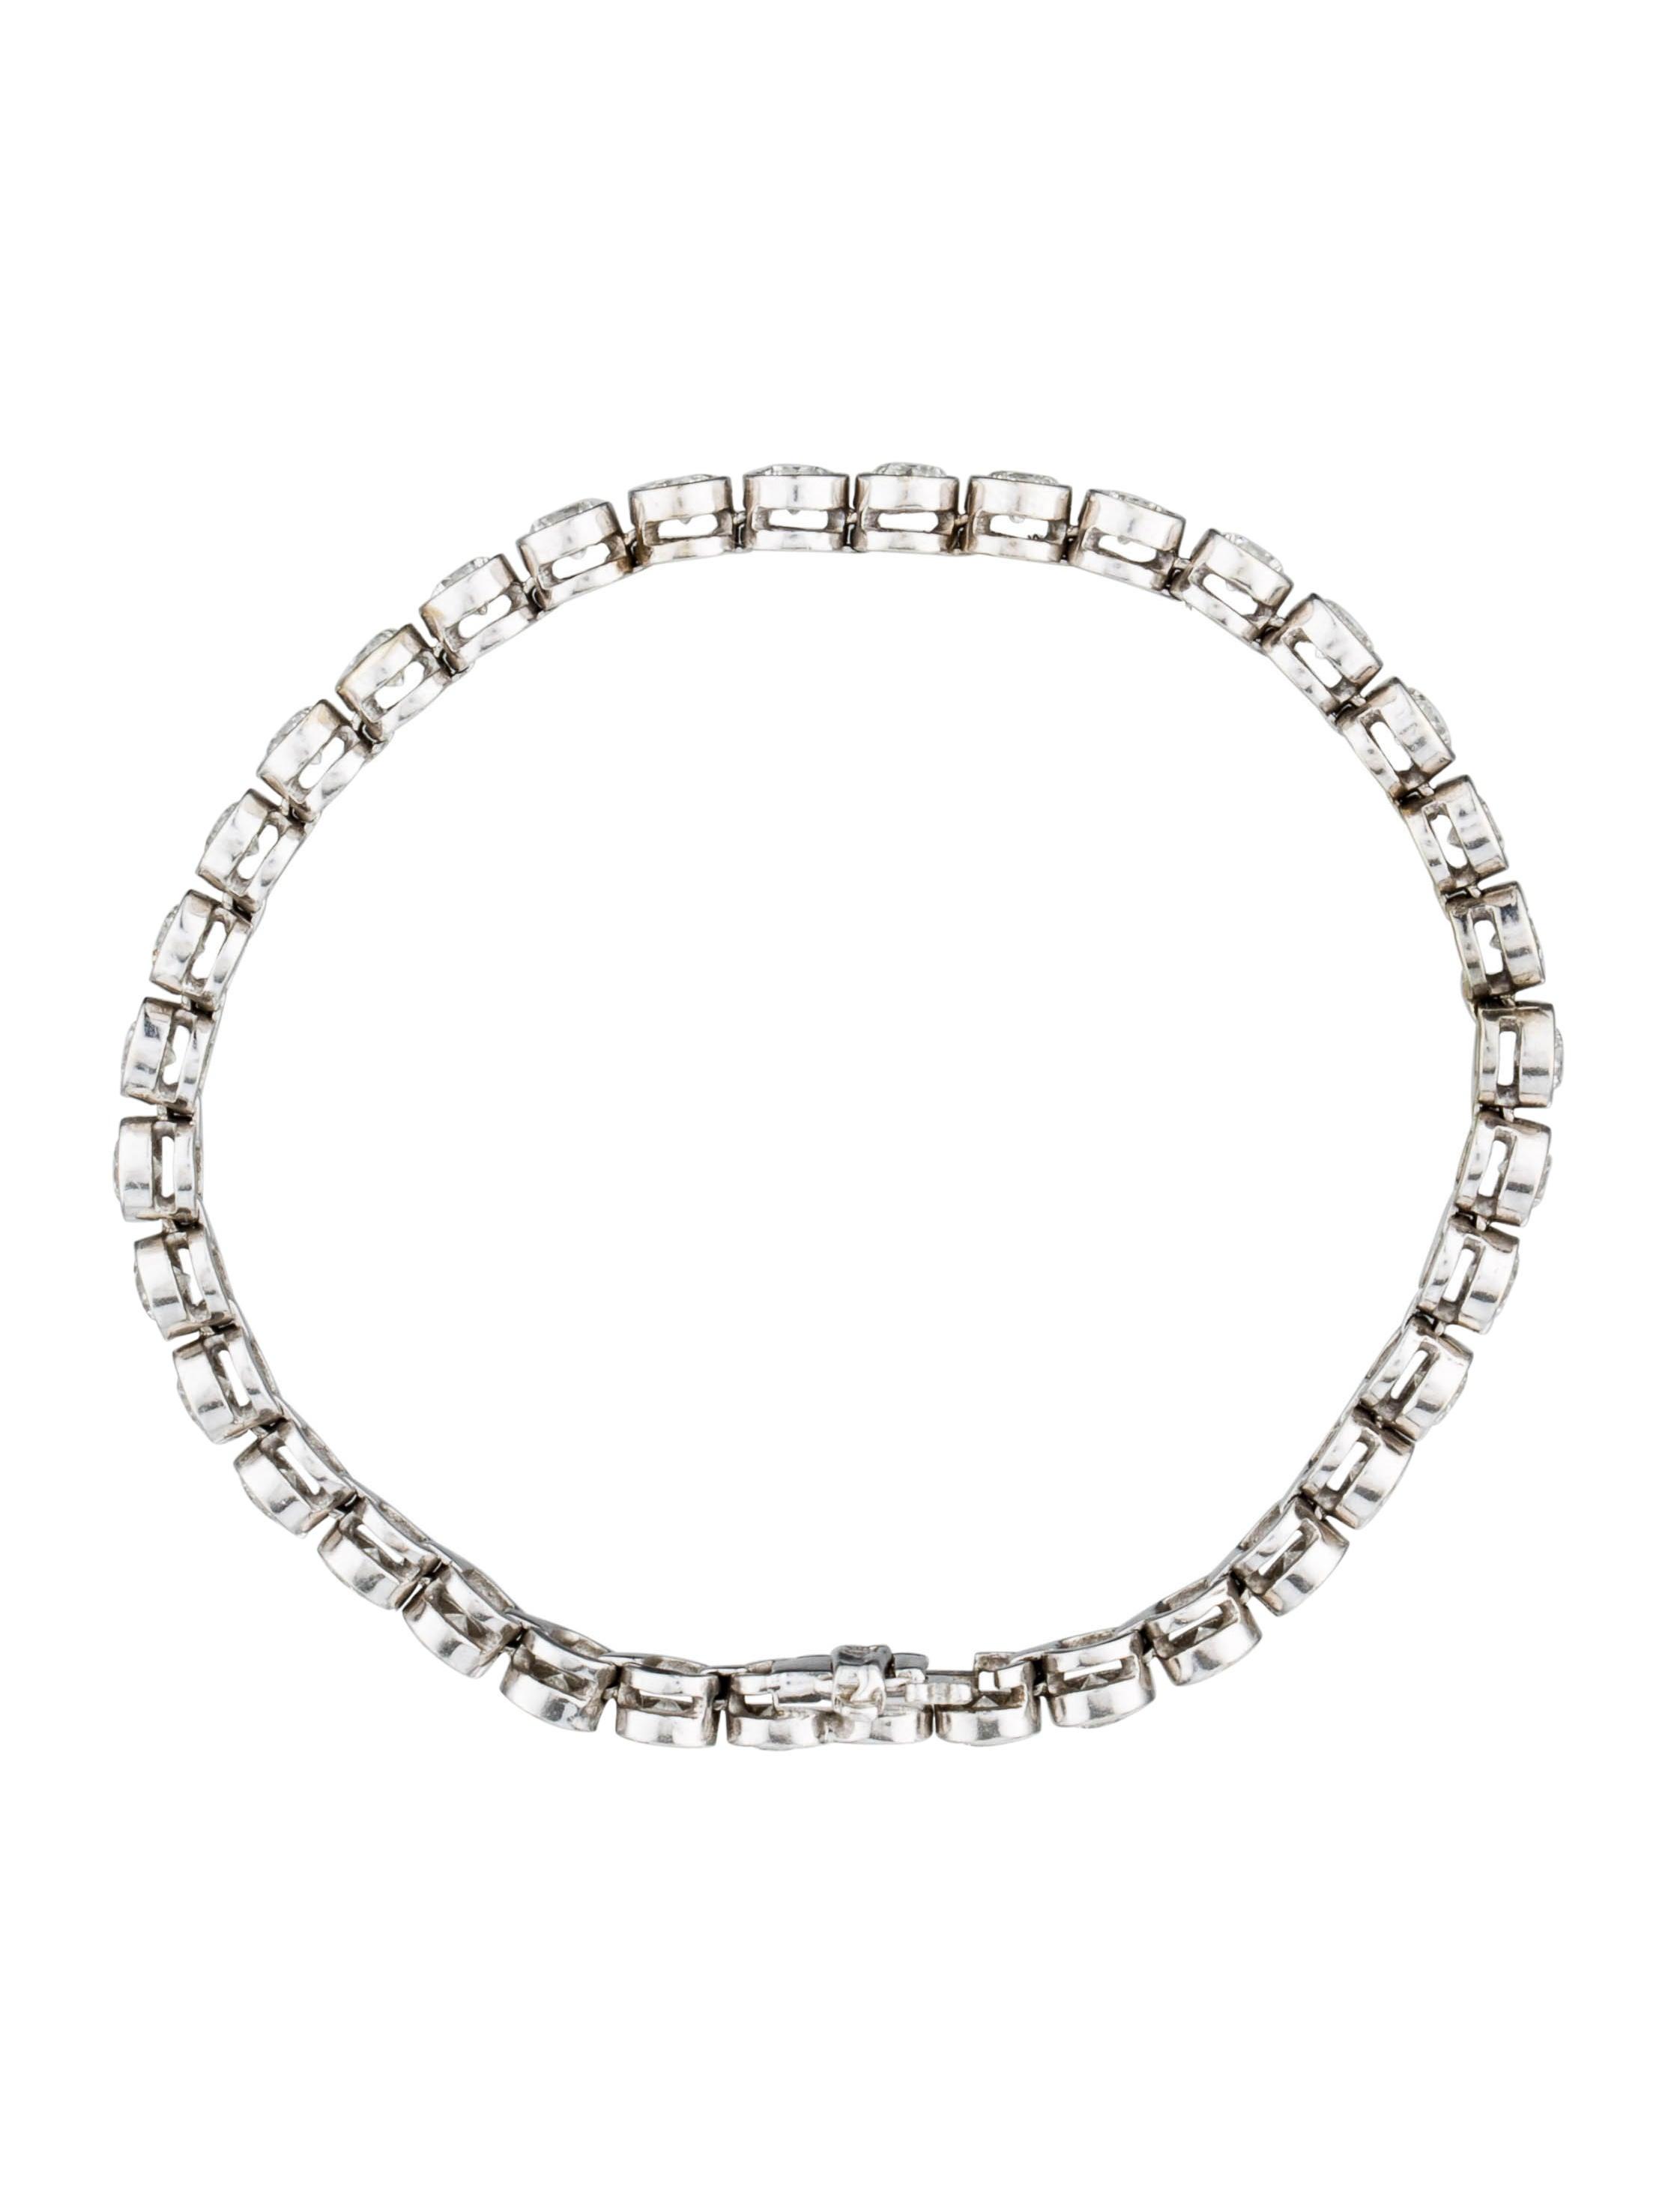 Id J 1301583 further Id J 310962 as well Id J 3128243 additionally 59435827 additionally Diamond Bracelets. on 25 carat diamond tennis bracelet